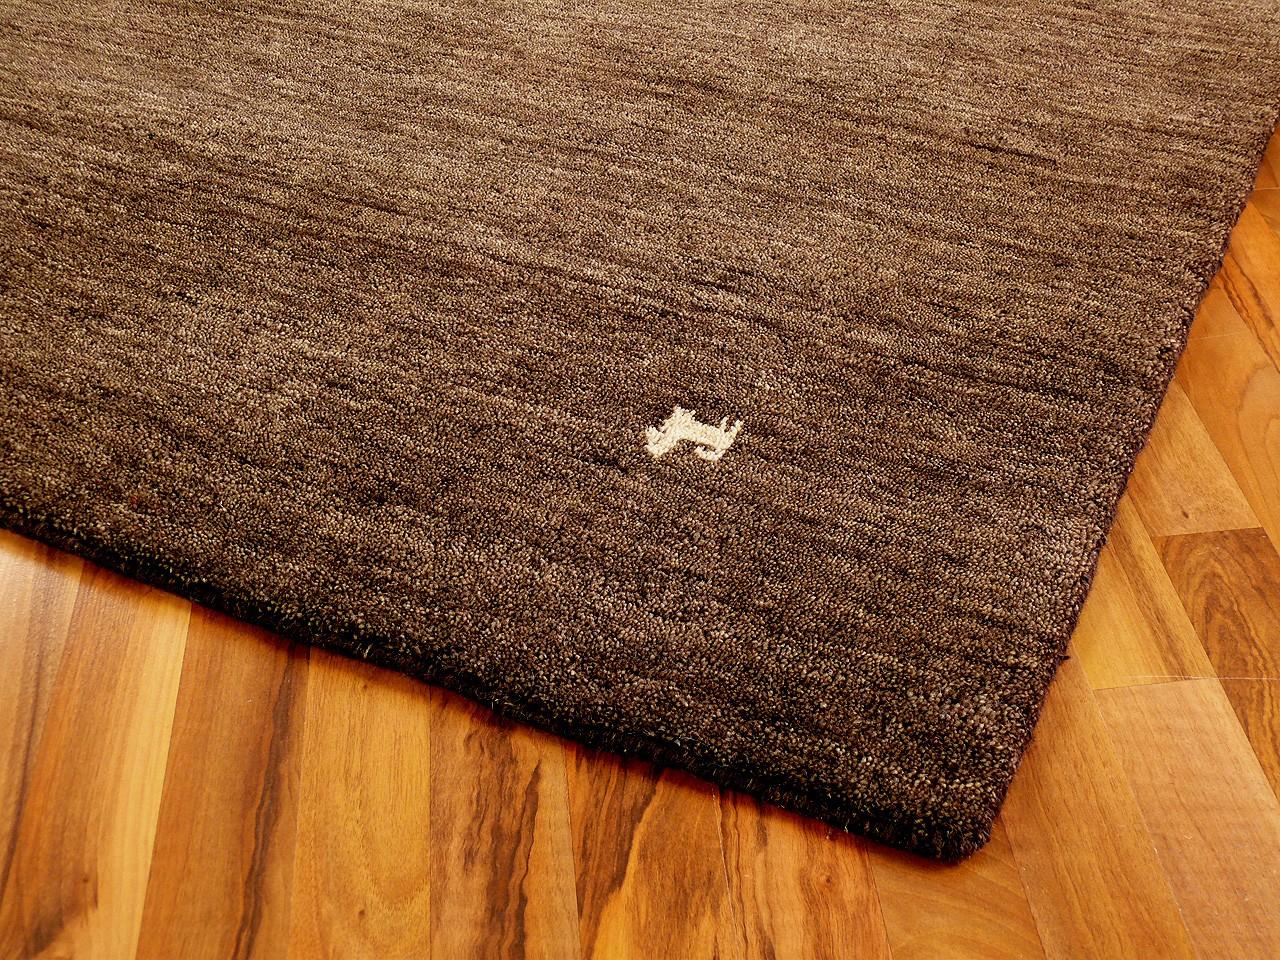 indo gabbeh teppich shiva braun uni teppiche nepal gabbeh und kelim teppiche indo gabbeh teppiche. Black Bedroom Furniture Sets. Home Design Ideas